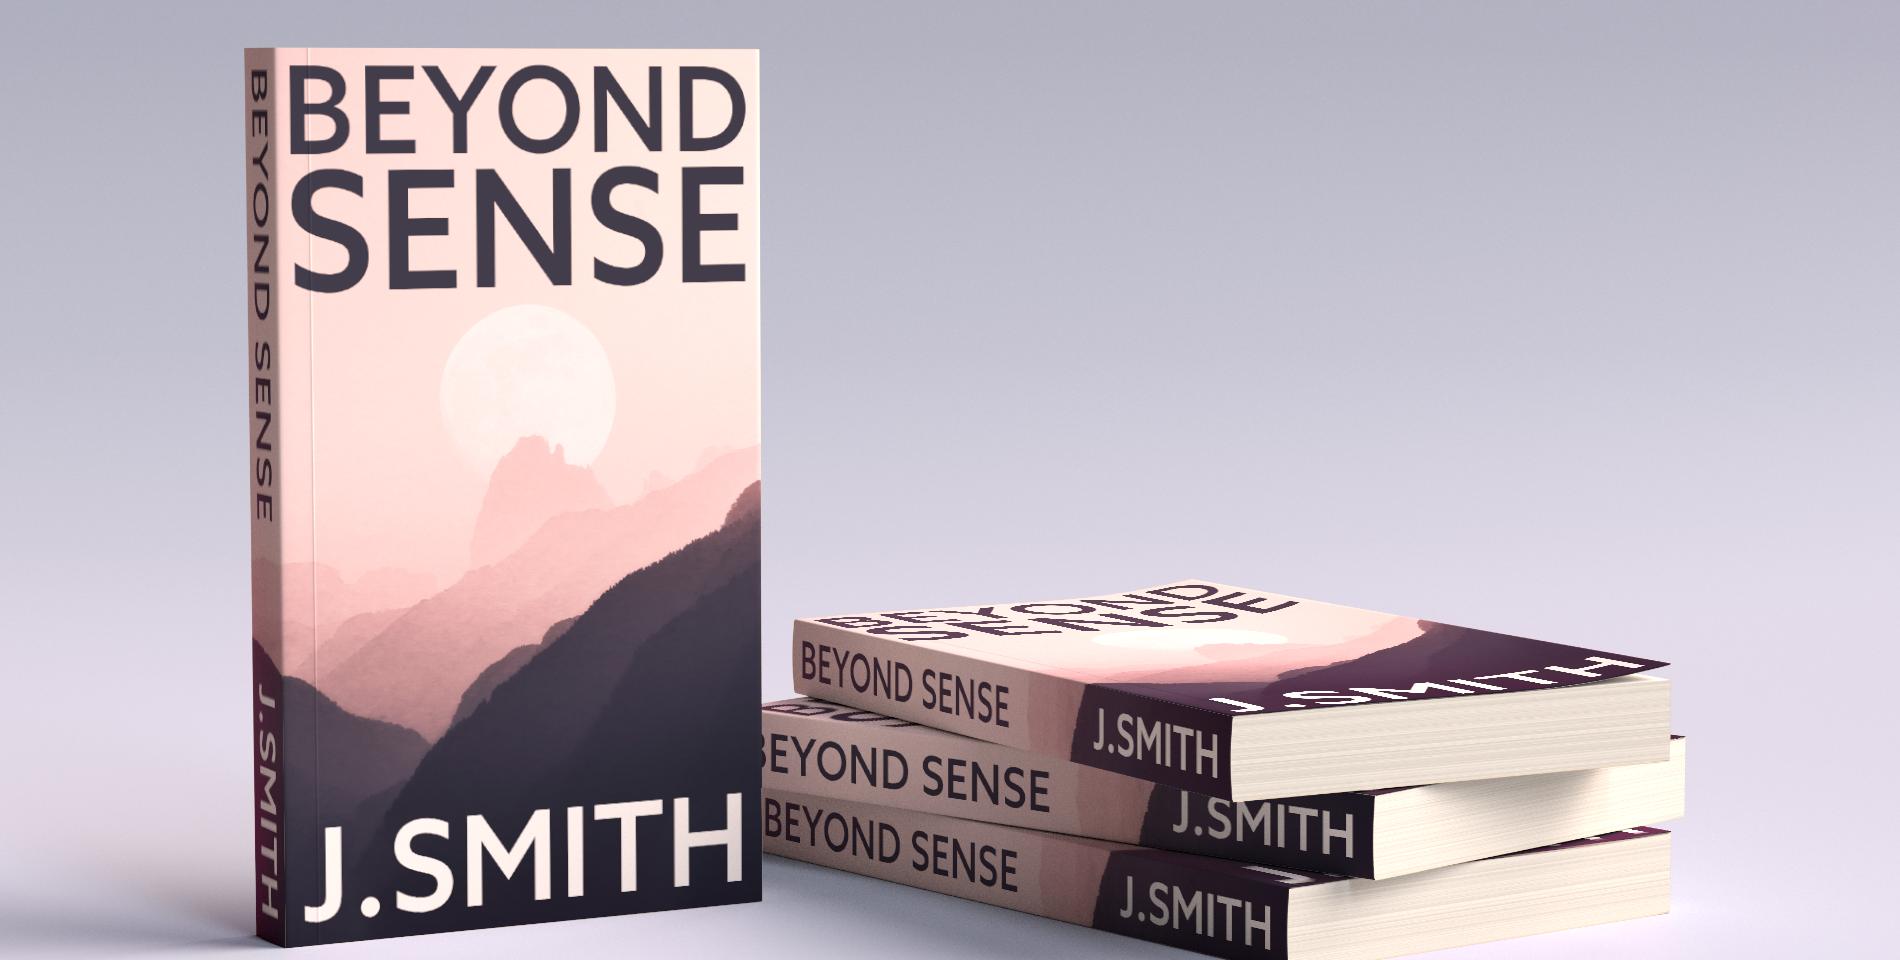 beyond sense book cover